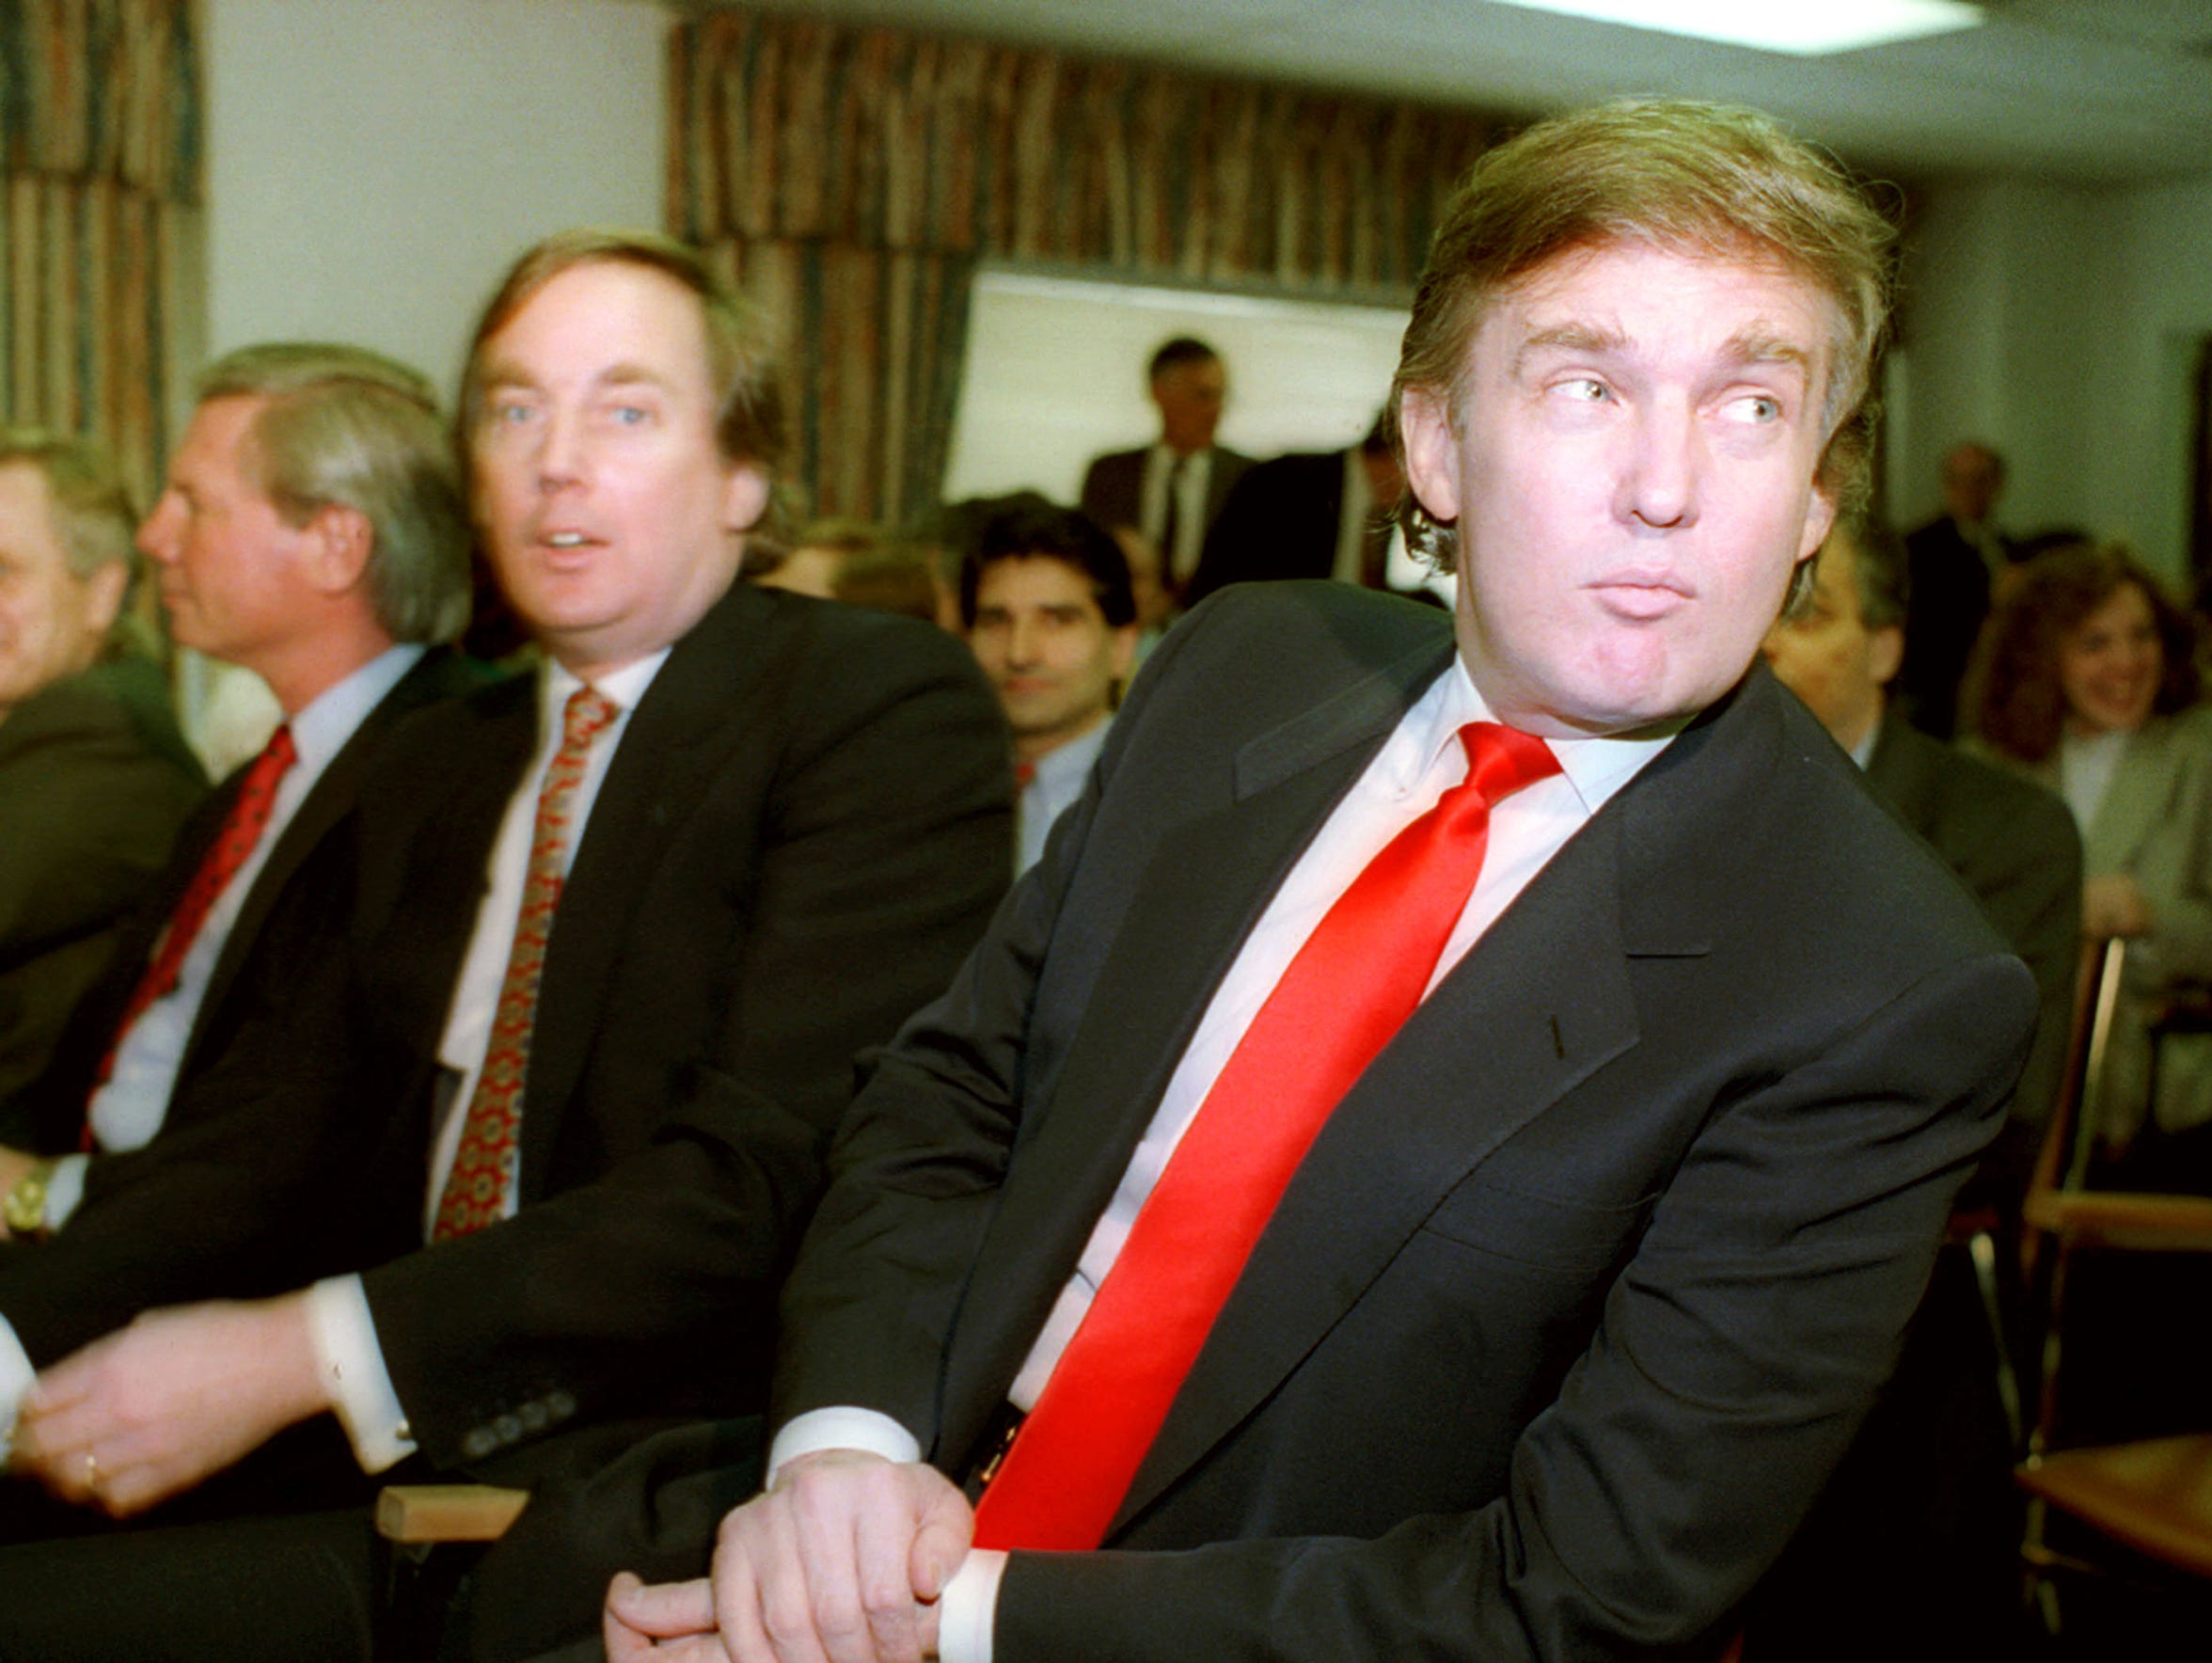 How Did Trump Make His Money